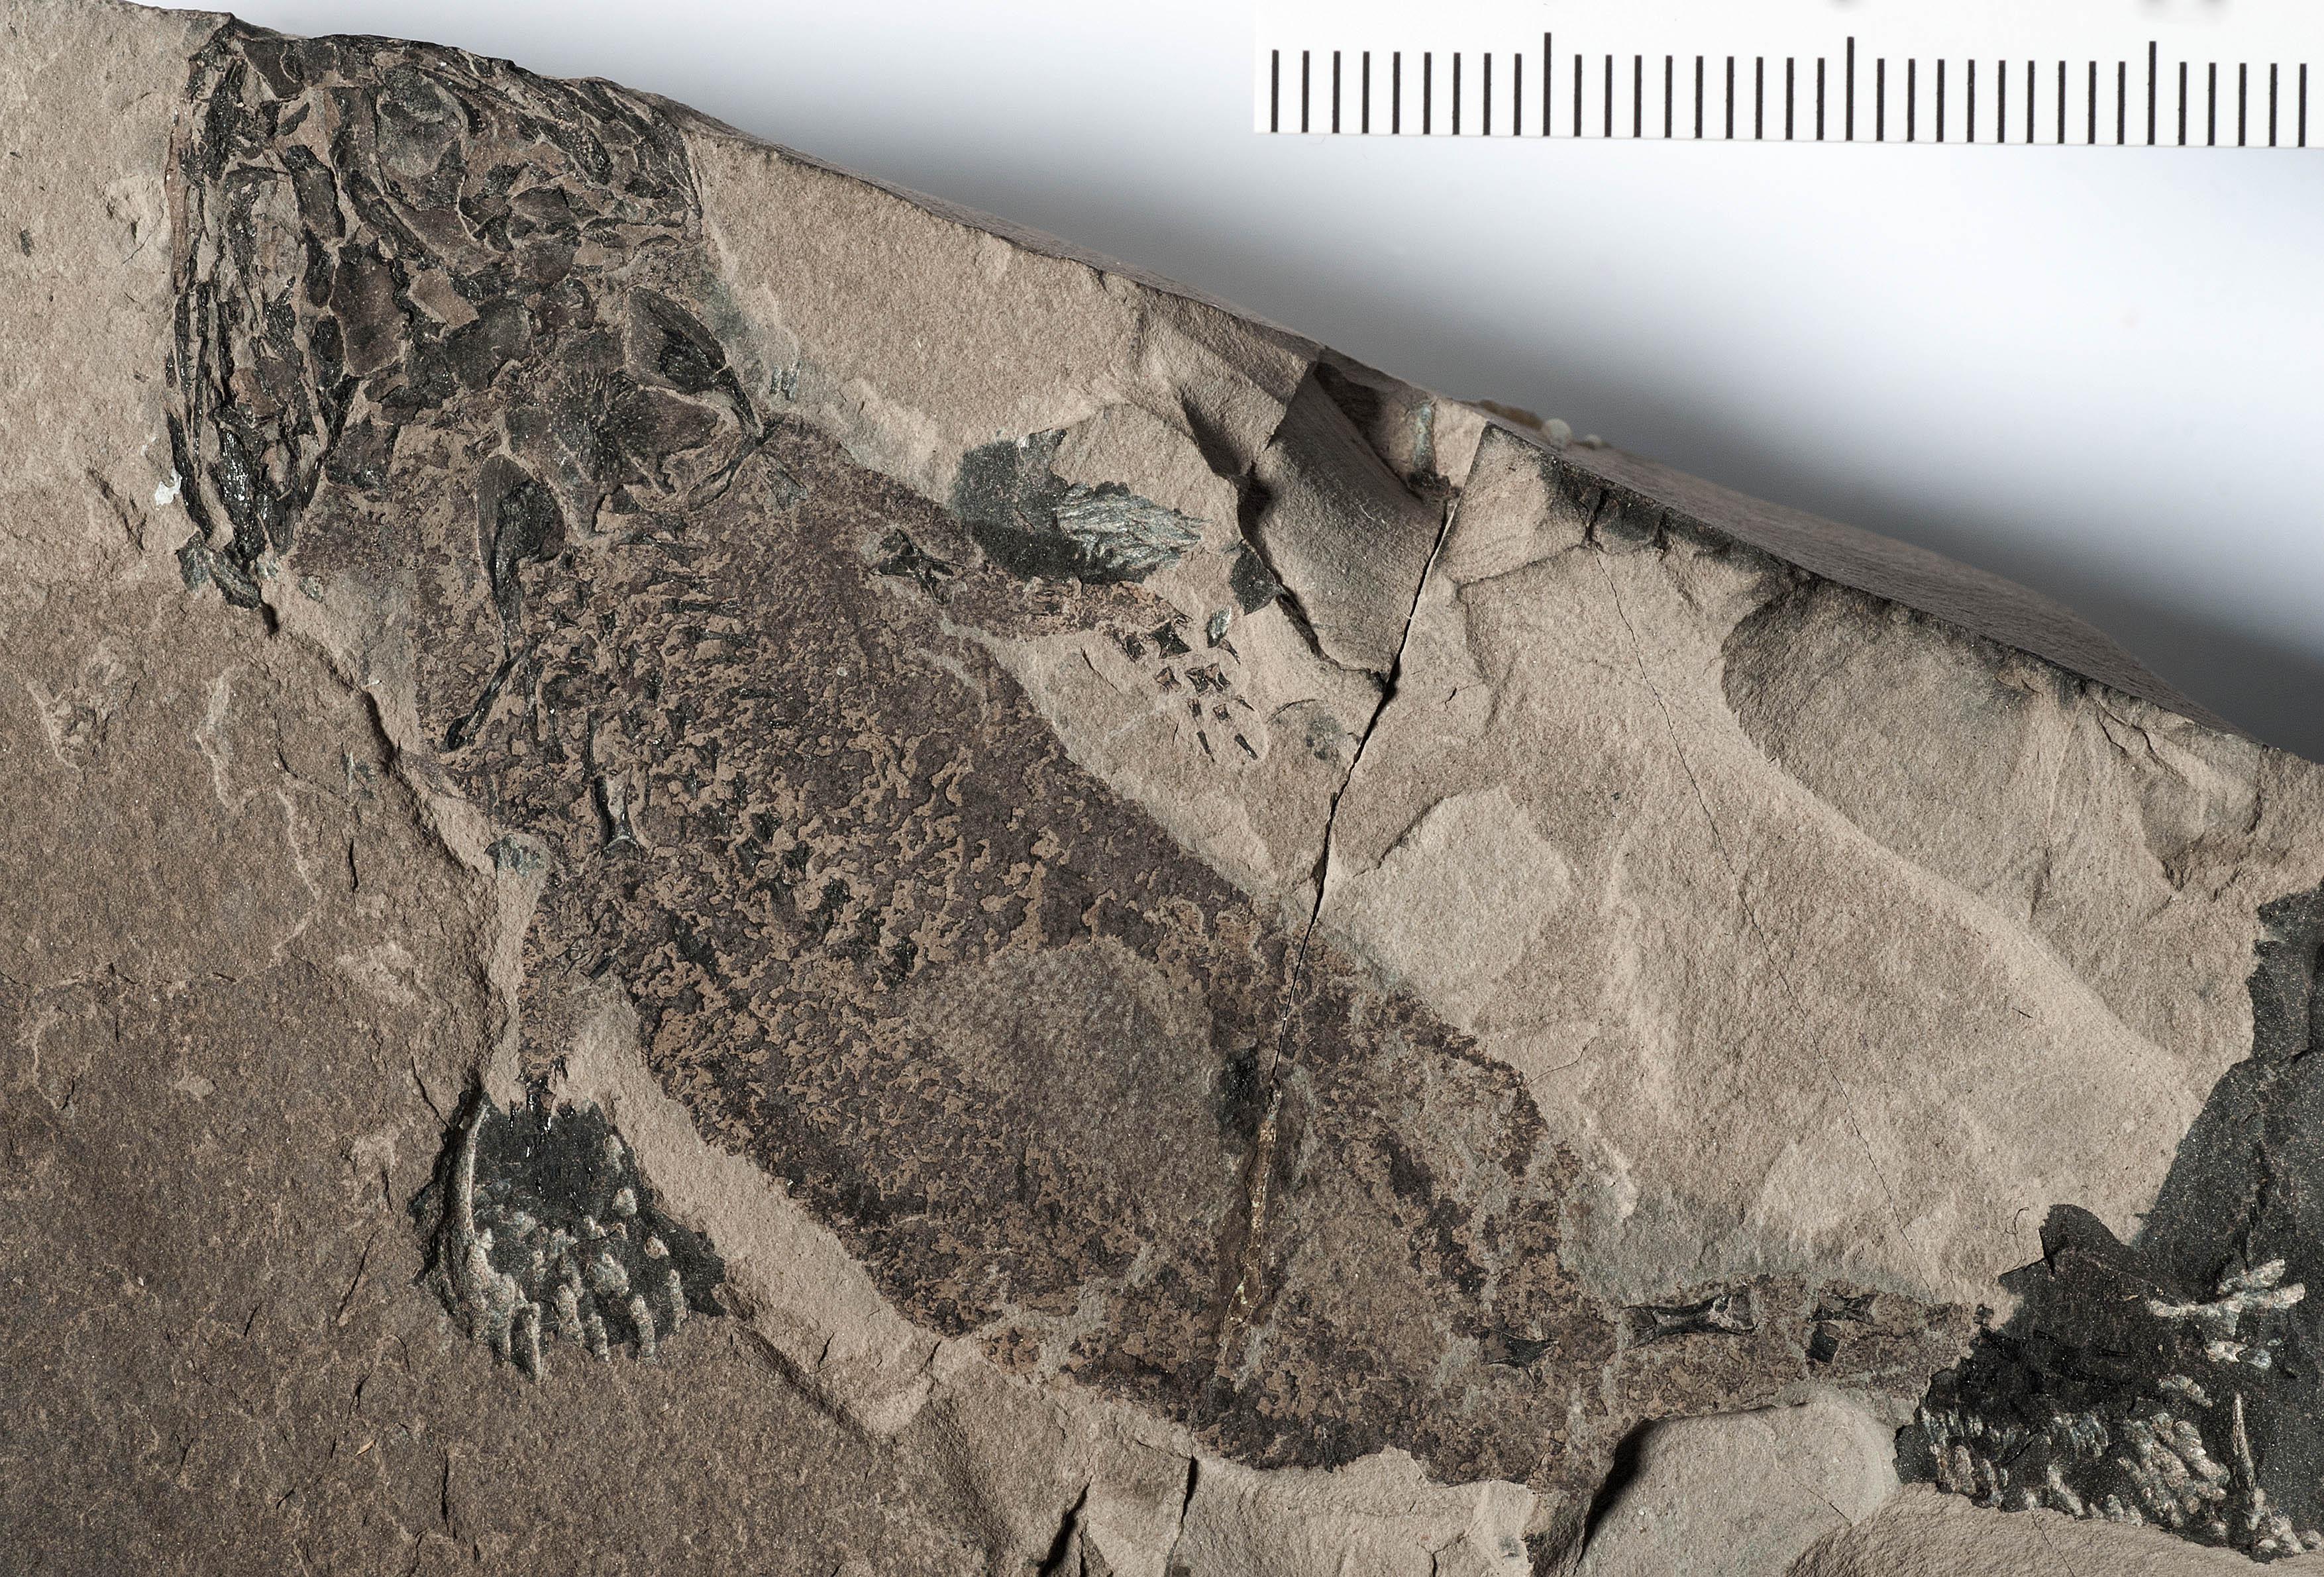 Micromelerpeton credneri fossil